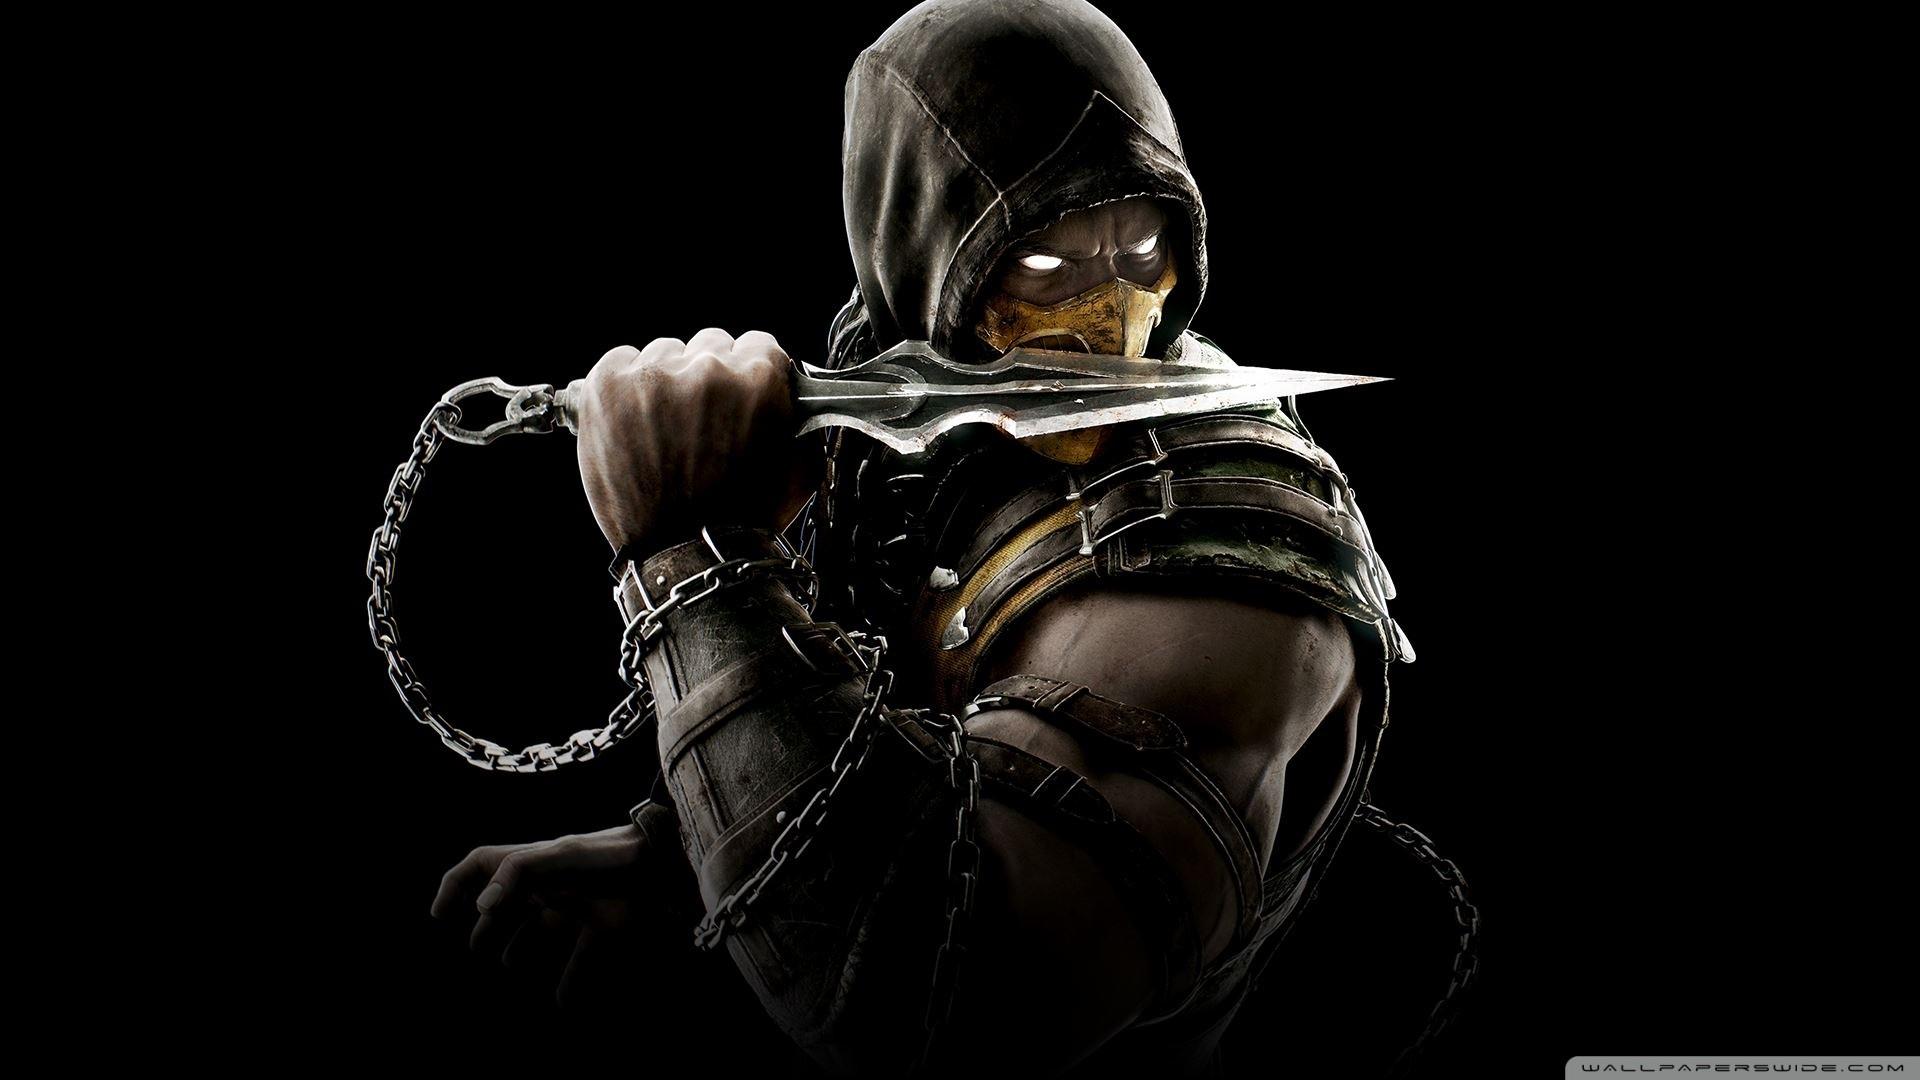 2560x1440 Games Ermac Wallpaper Mortal Kombat X